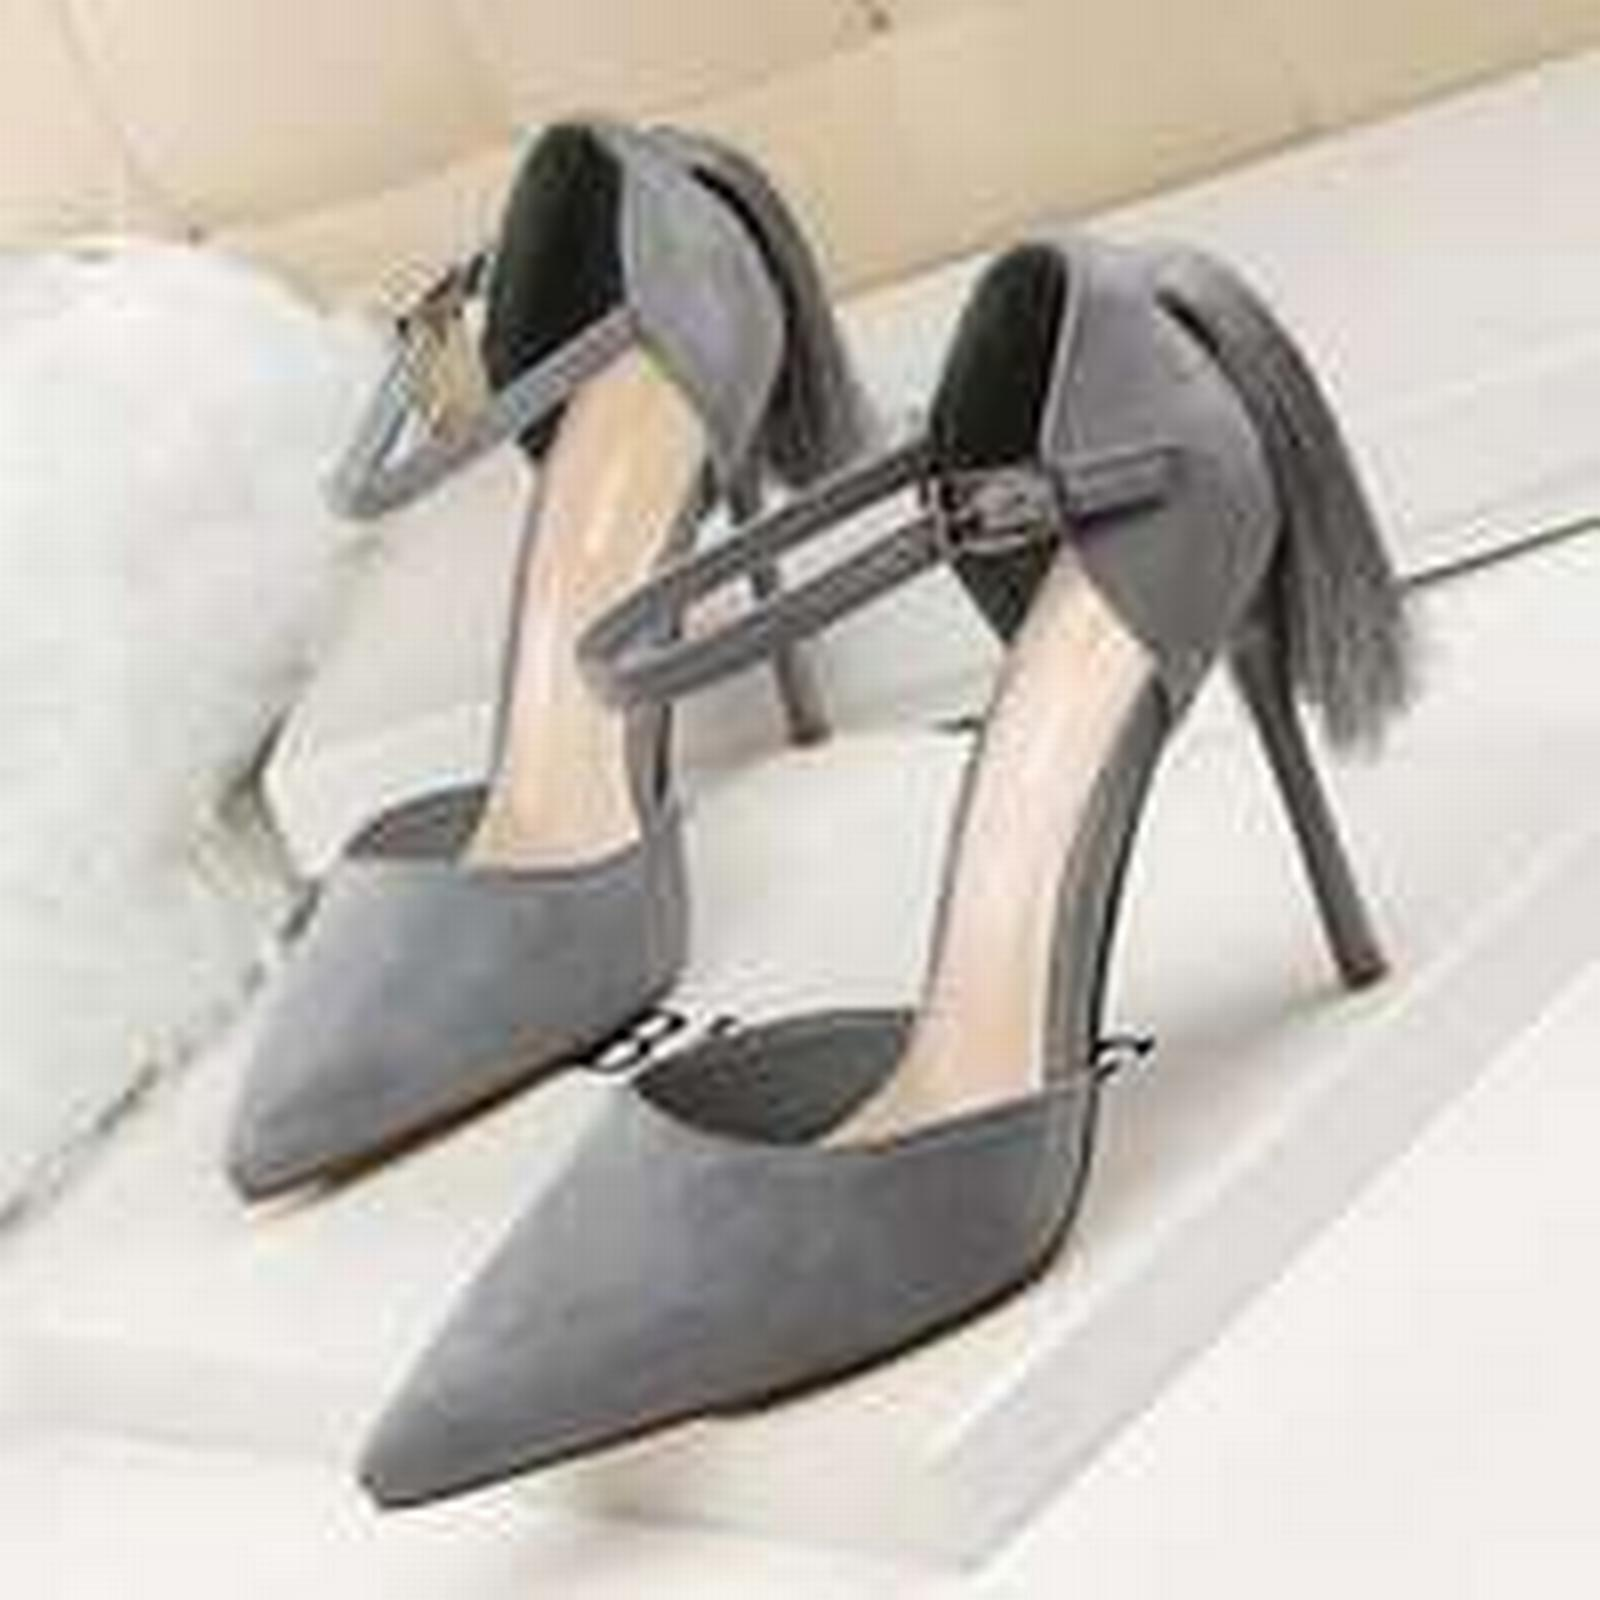 Bonanza (Global) sandals pp257 elegant pointy ankle sandals (Global) w big fringe, nubuck, US Size 4-8, gray 57545d